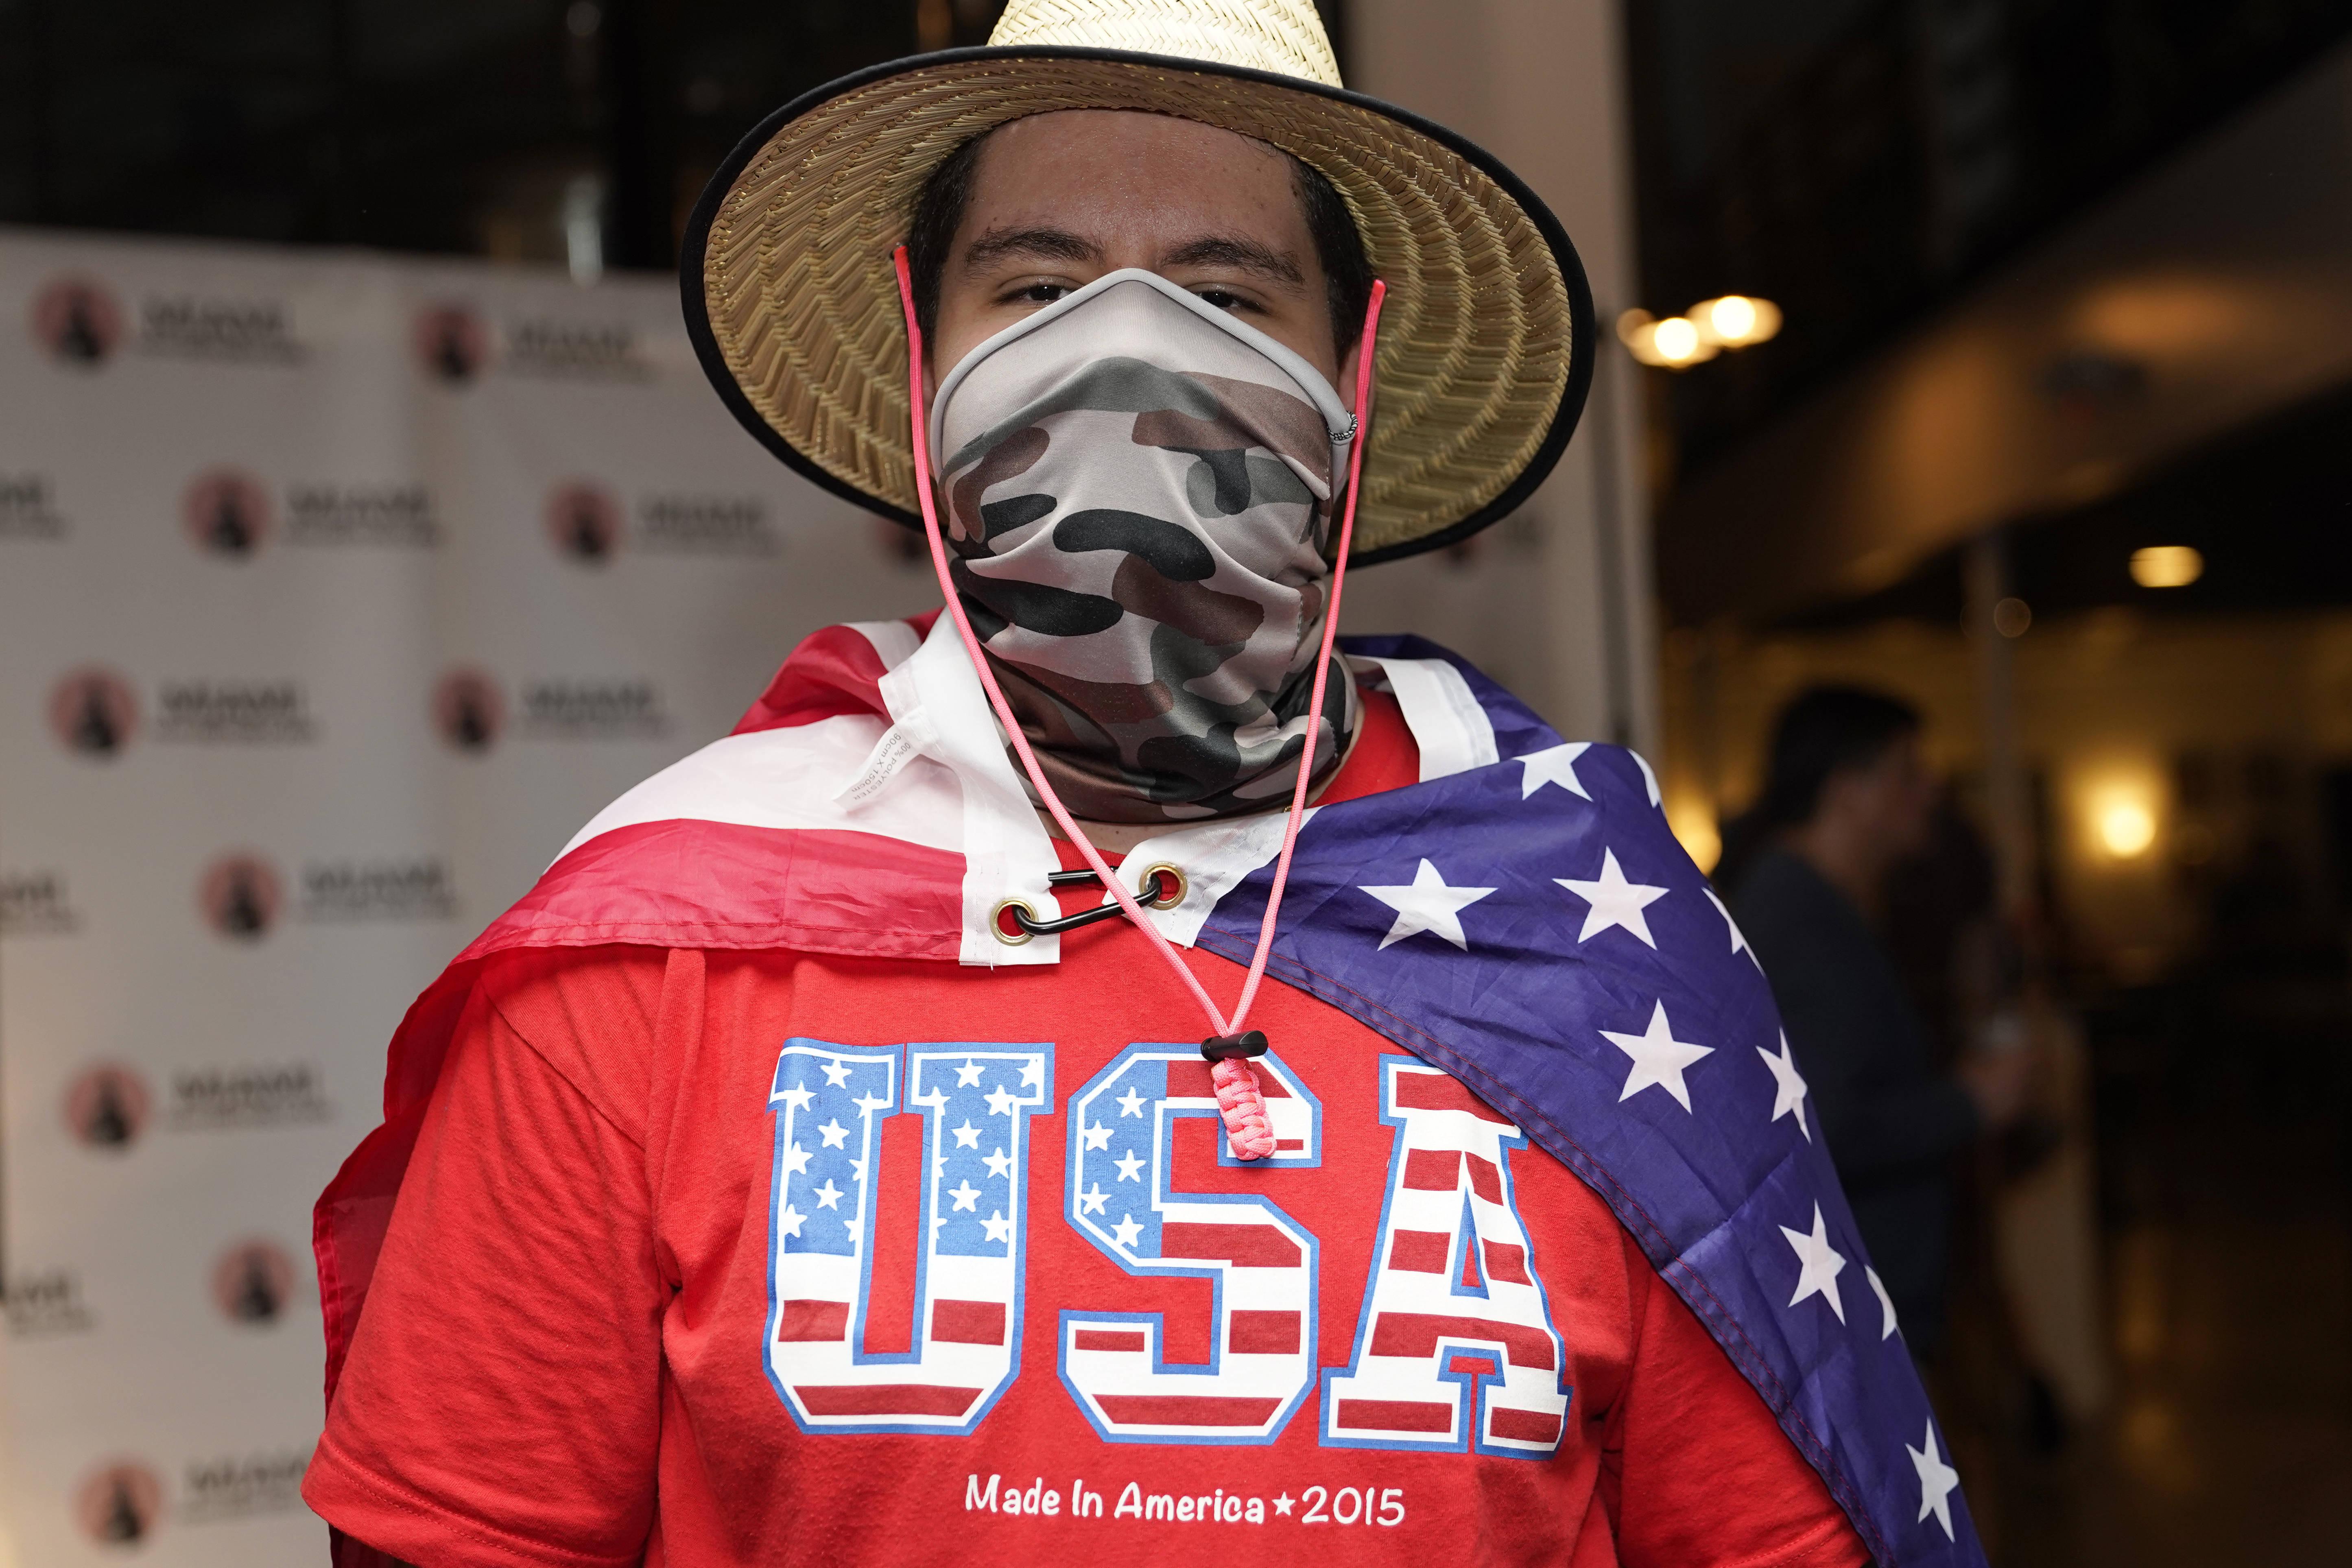 A Trump supporter in Miami. (Lynne Sladky/AP)